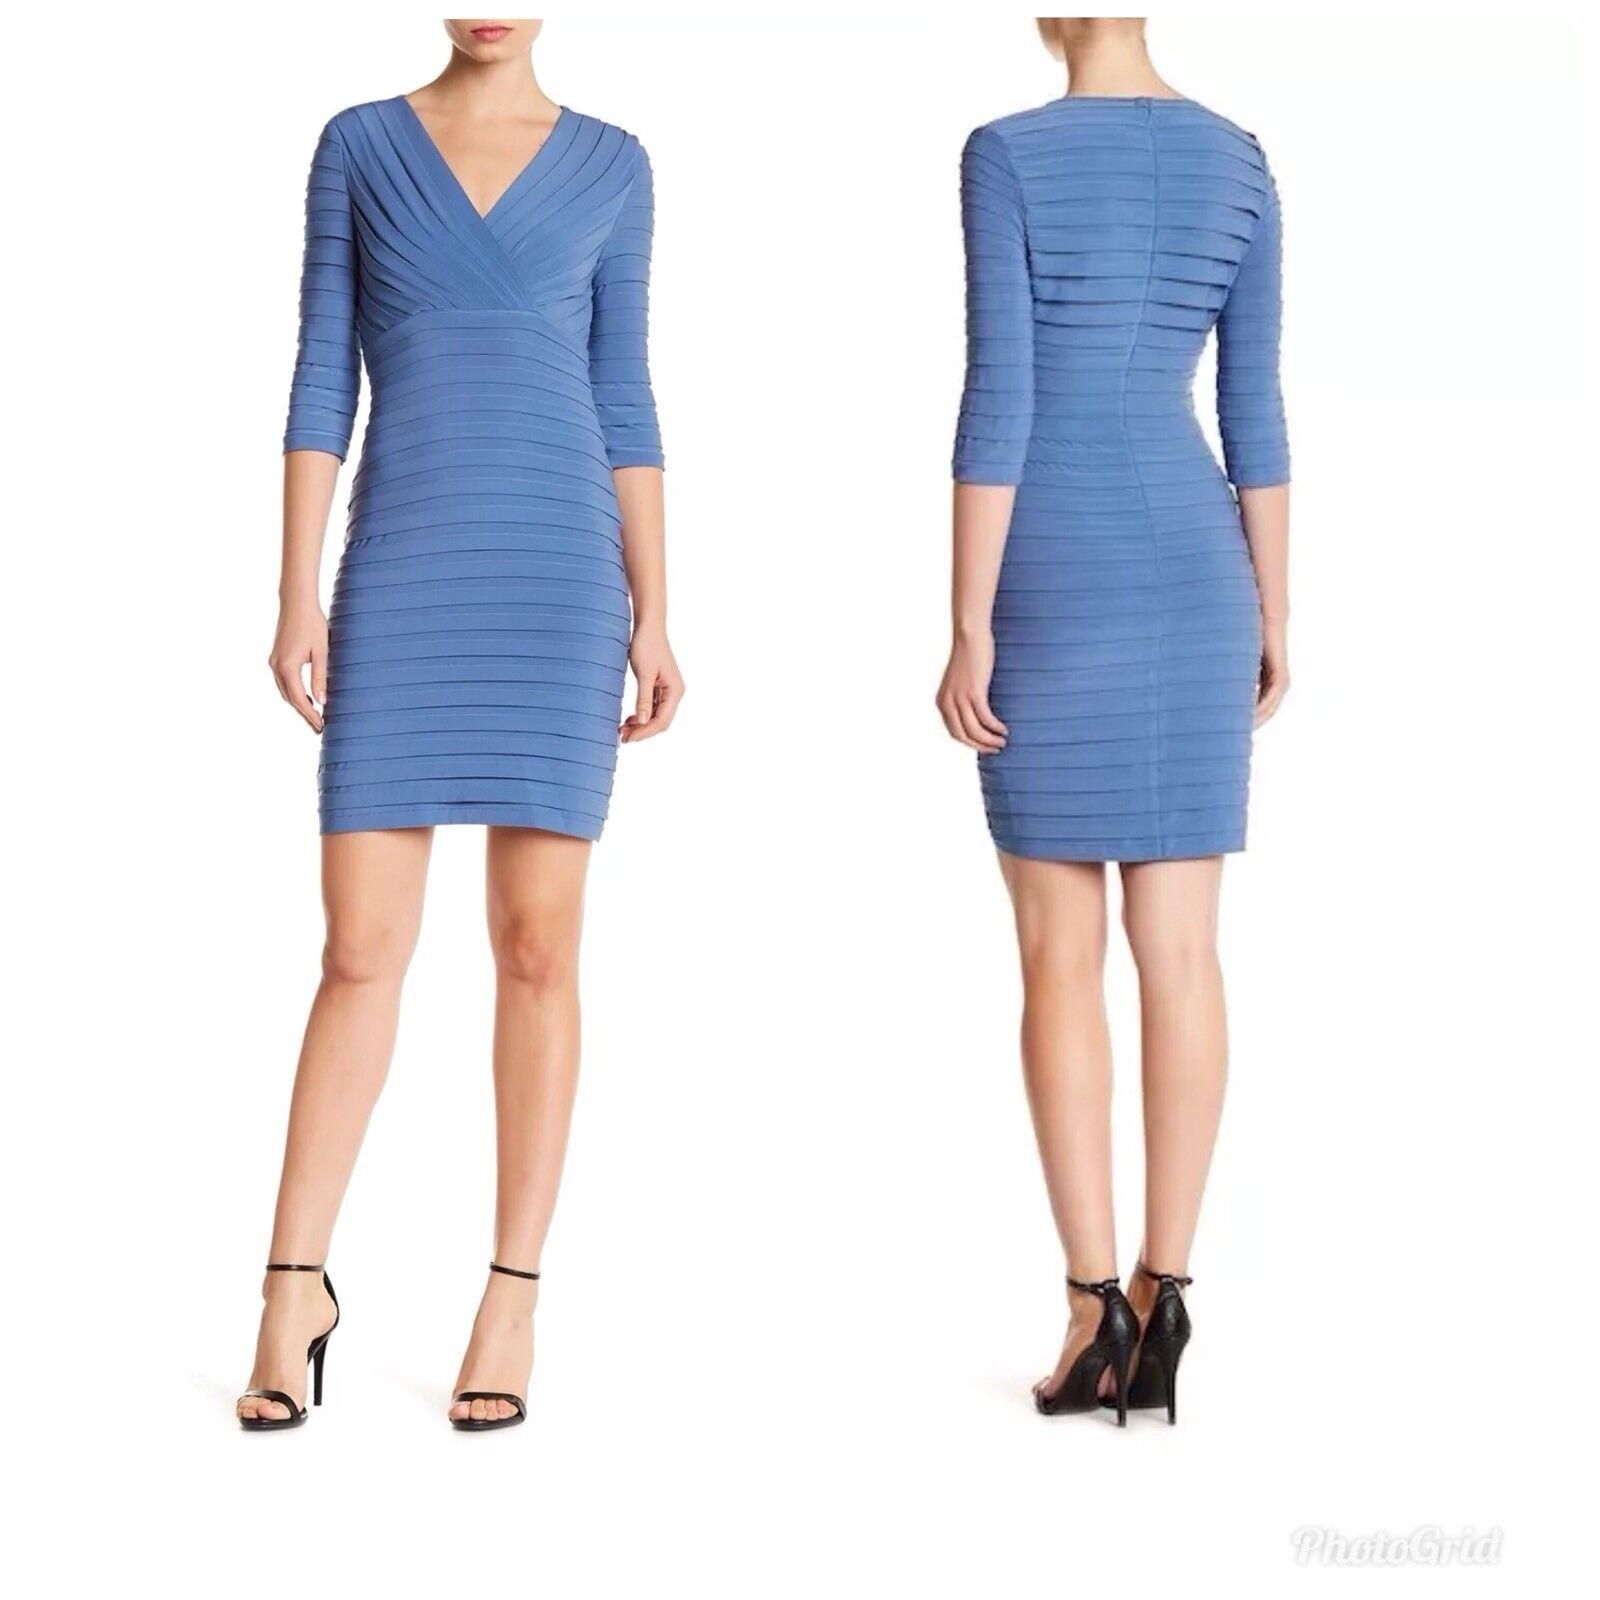 Adrianna Papell Pleated Jersey Sheath Dress Bodycon Steel Blau V Neck 3 4 Sleeve